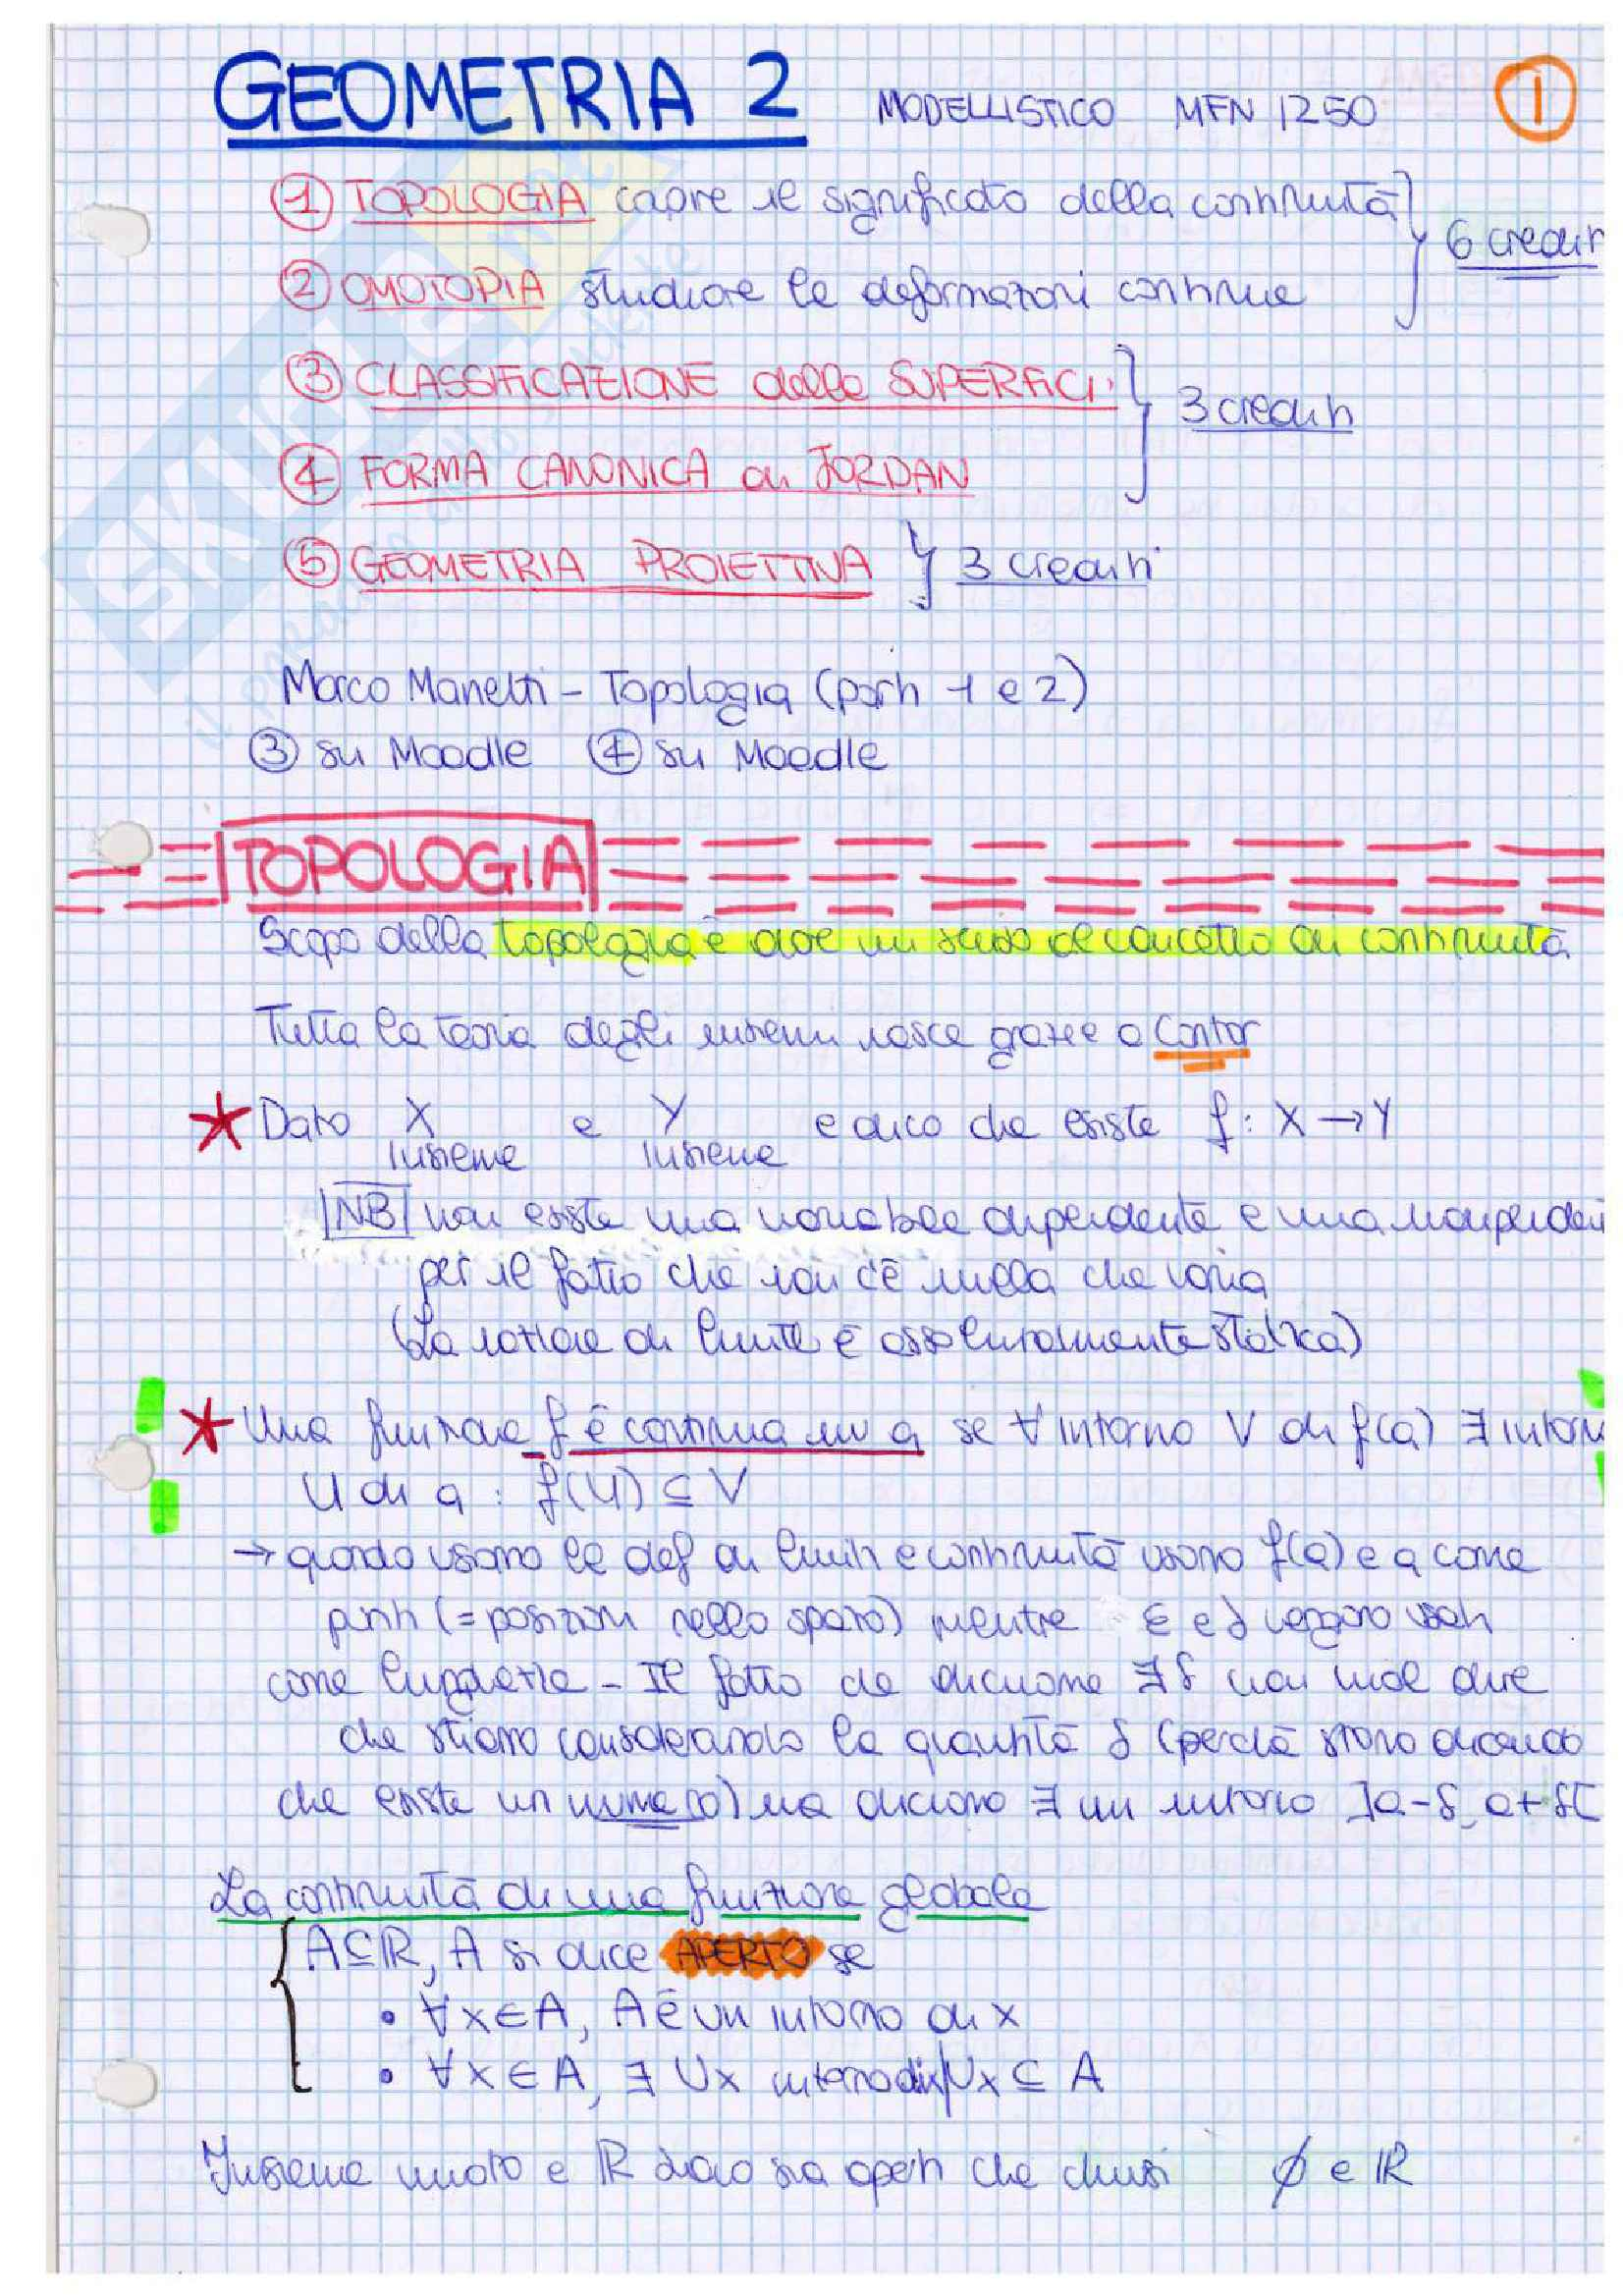 Geometria 2, appunti ed esercizi